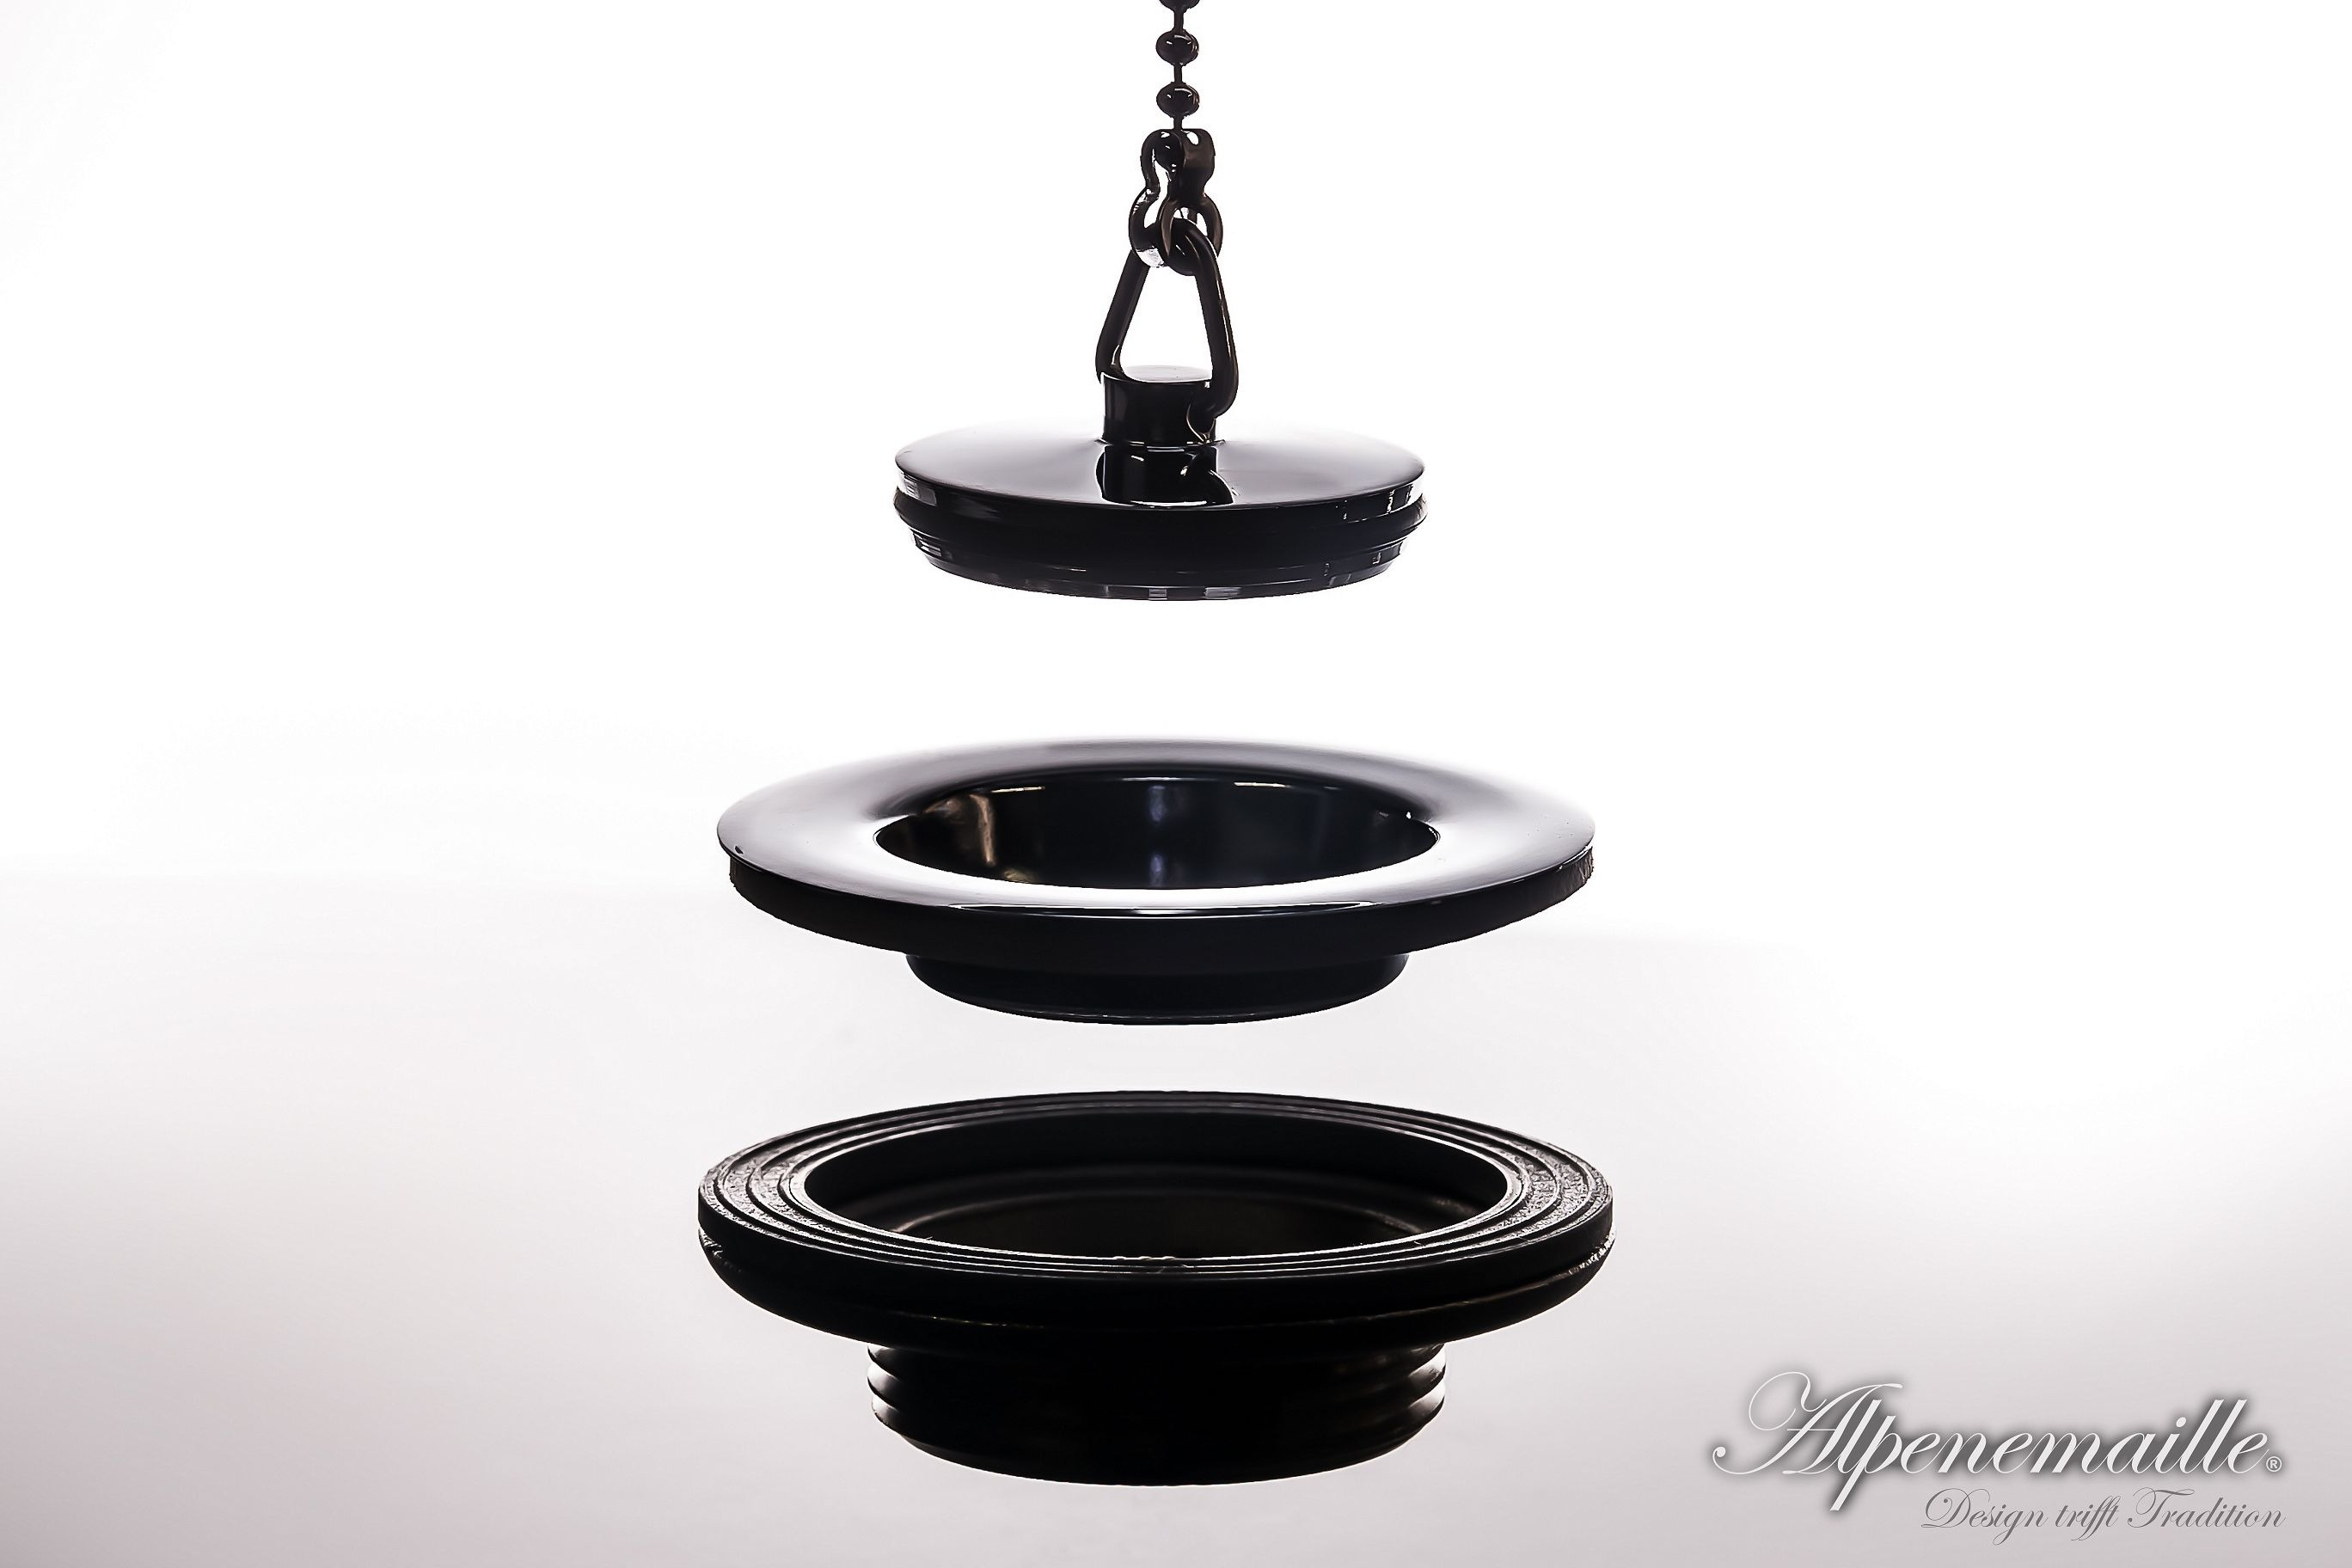 Premium retro basin waste with brass & rubber plug and ball chain